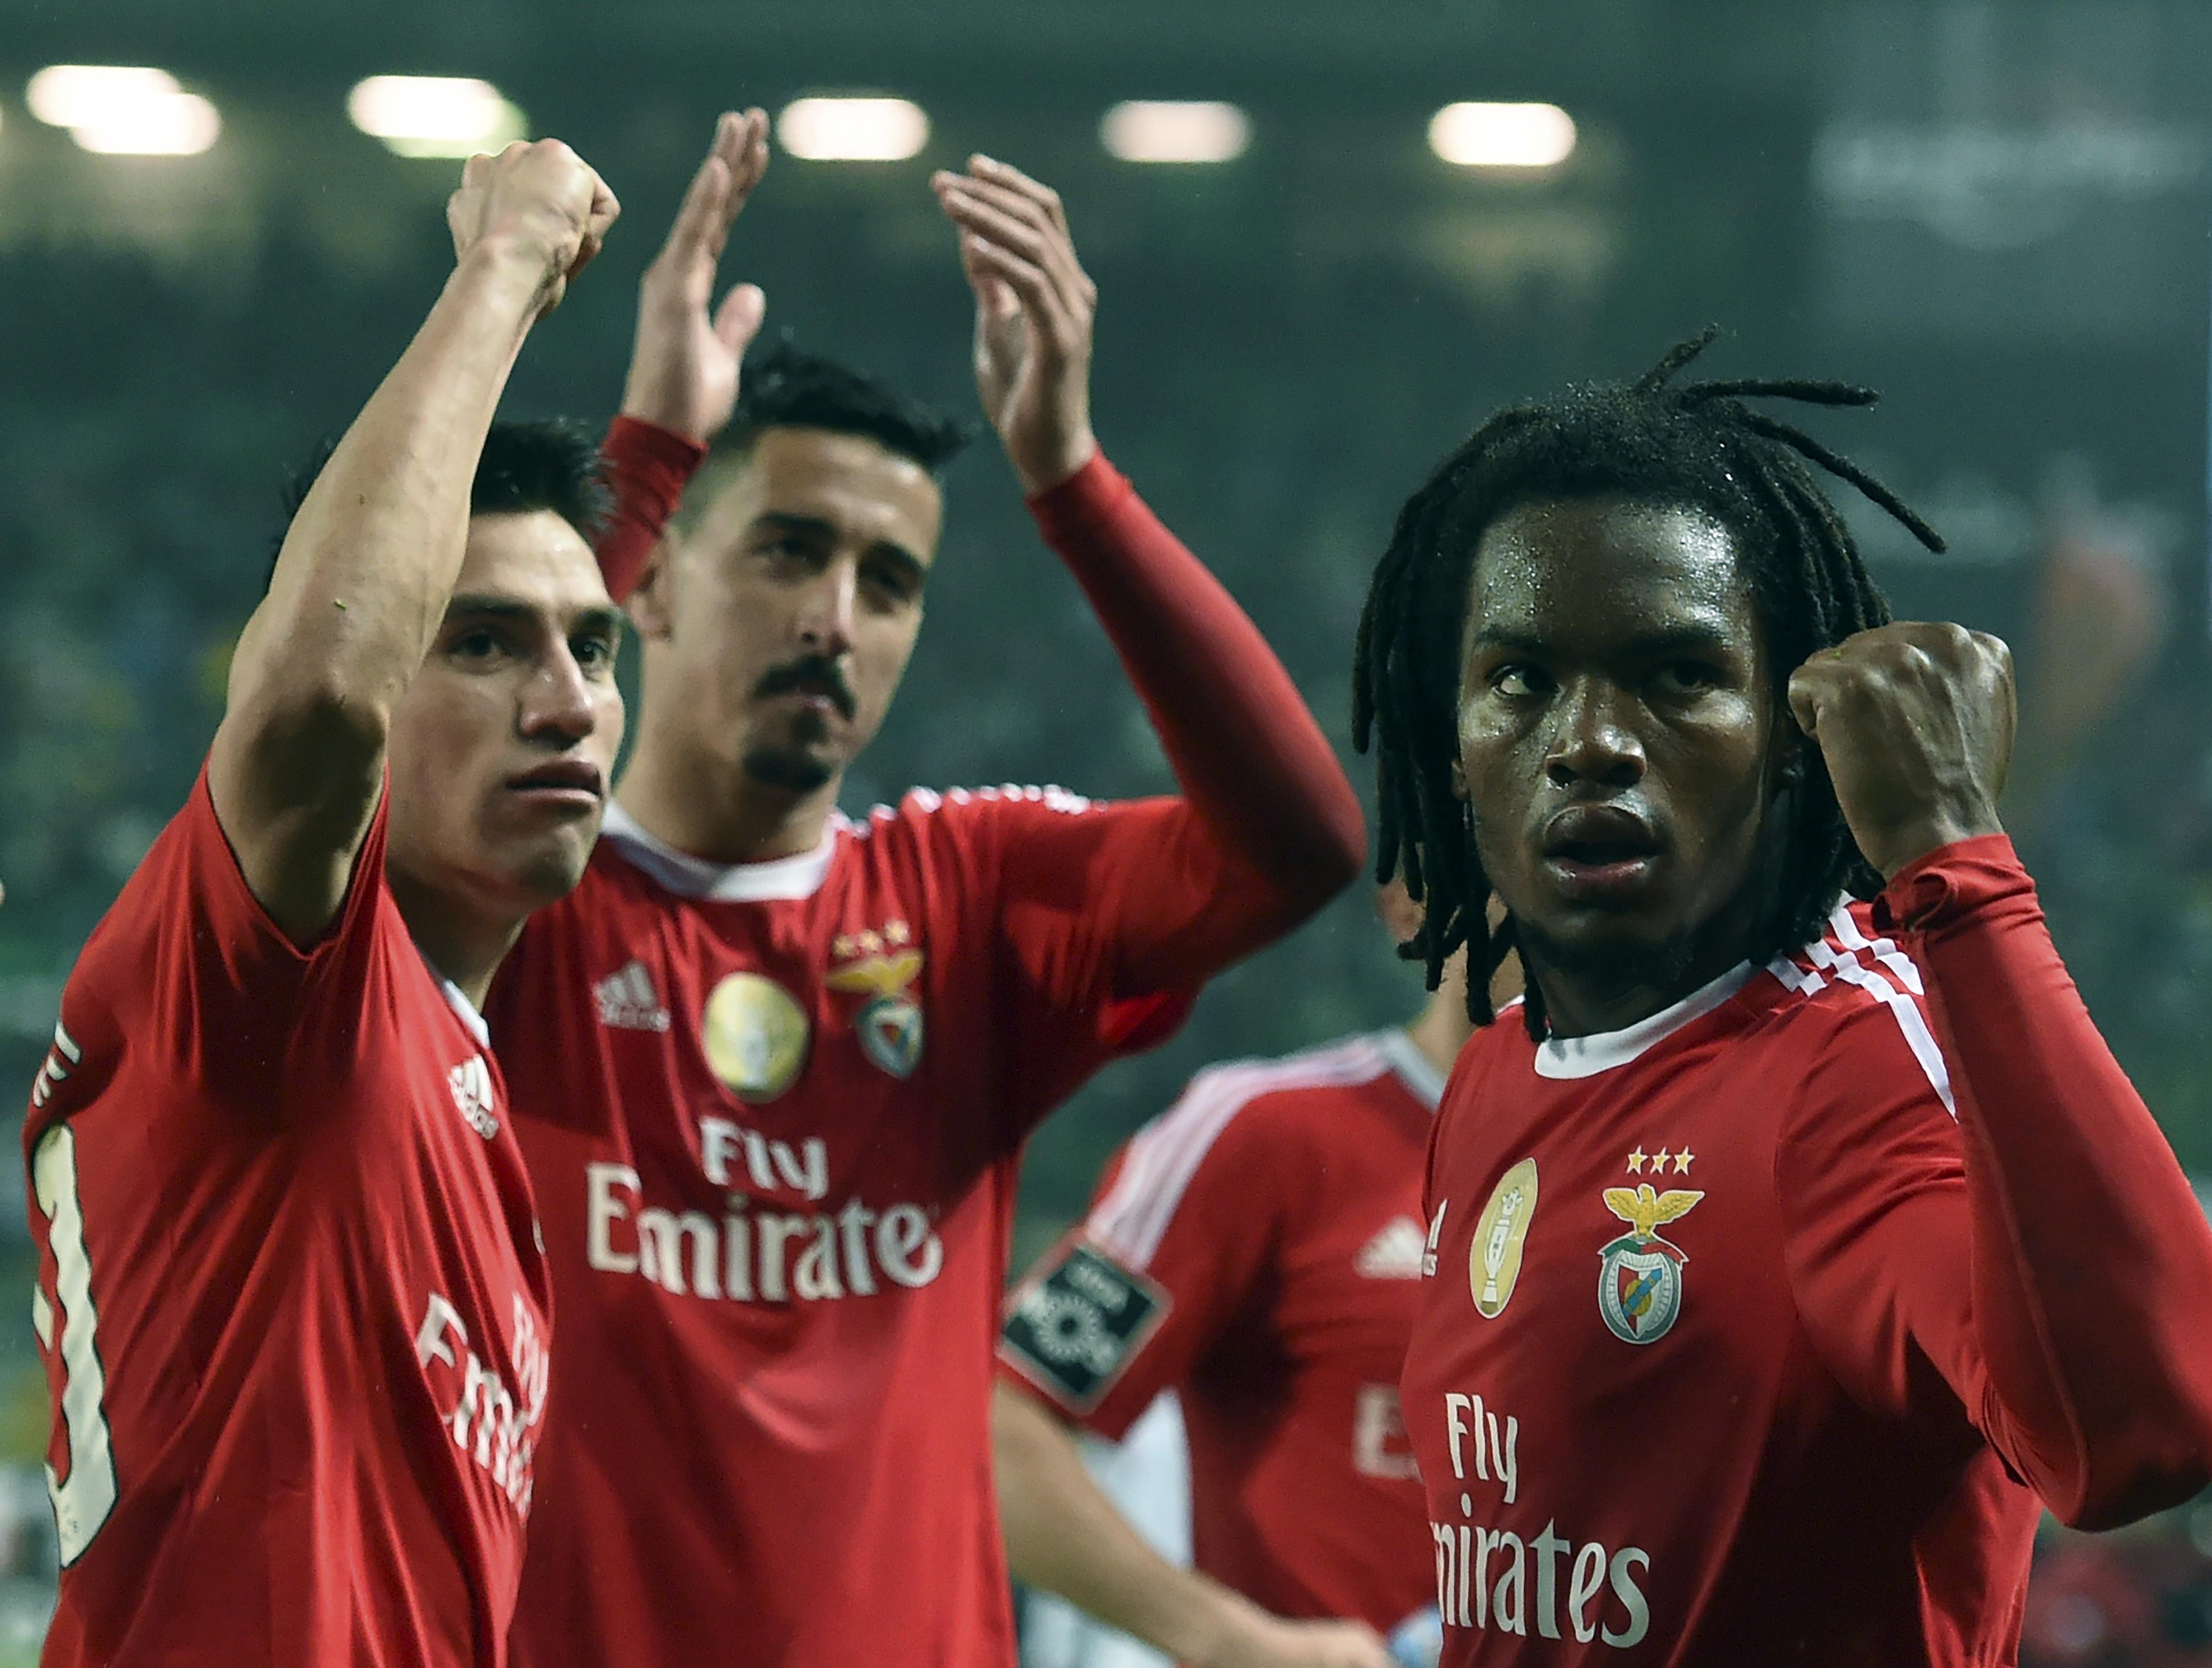 Benfica, Bayern Munich, Benfica stream, Bayern Munich stream, Benfica Bayern Munich stream , Benfica Bayern Munich, bayern munich streaming, Benfica Bayern Munich live, bayern champions league stream, Benfica bayern stream, champions league